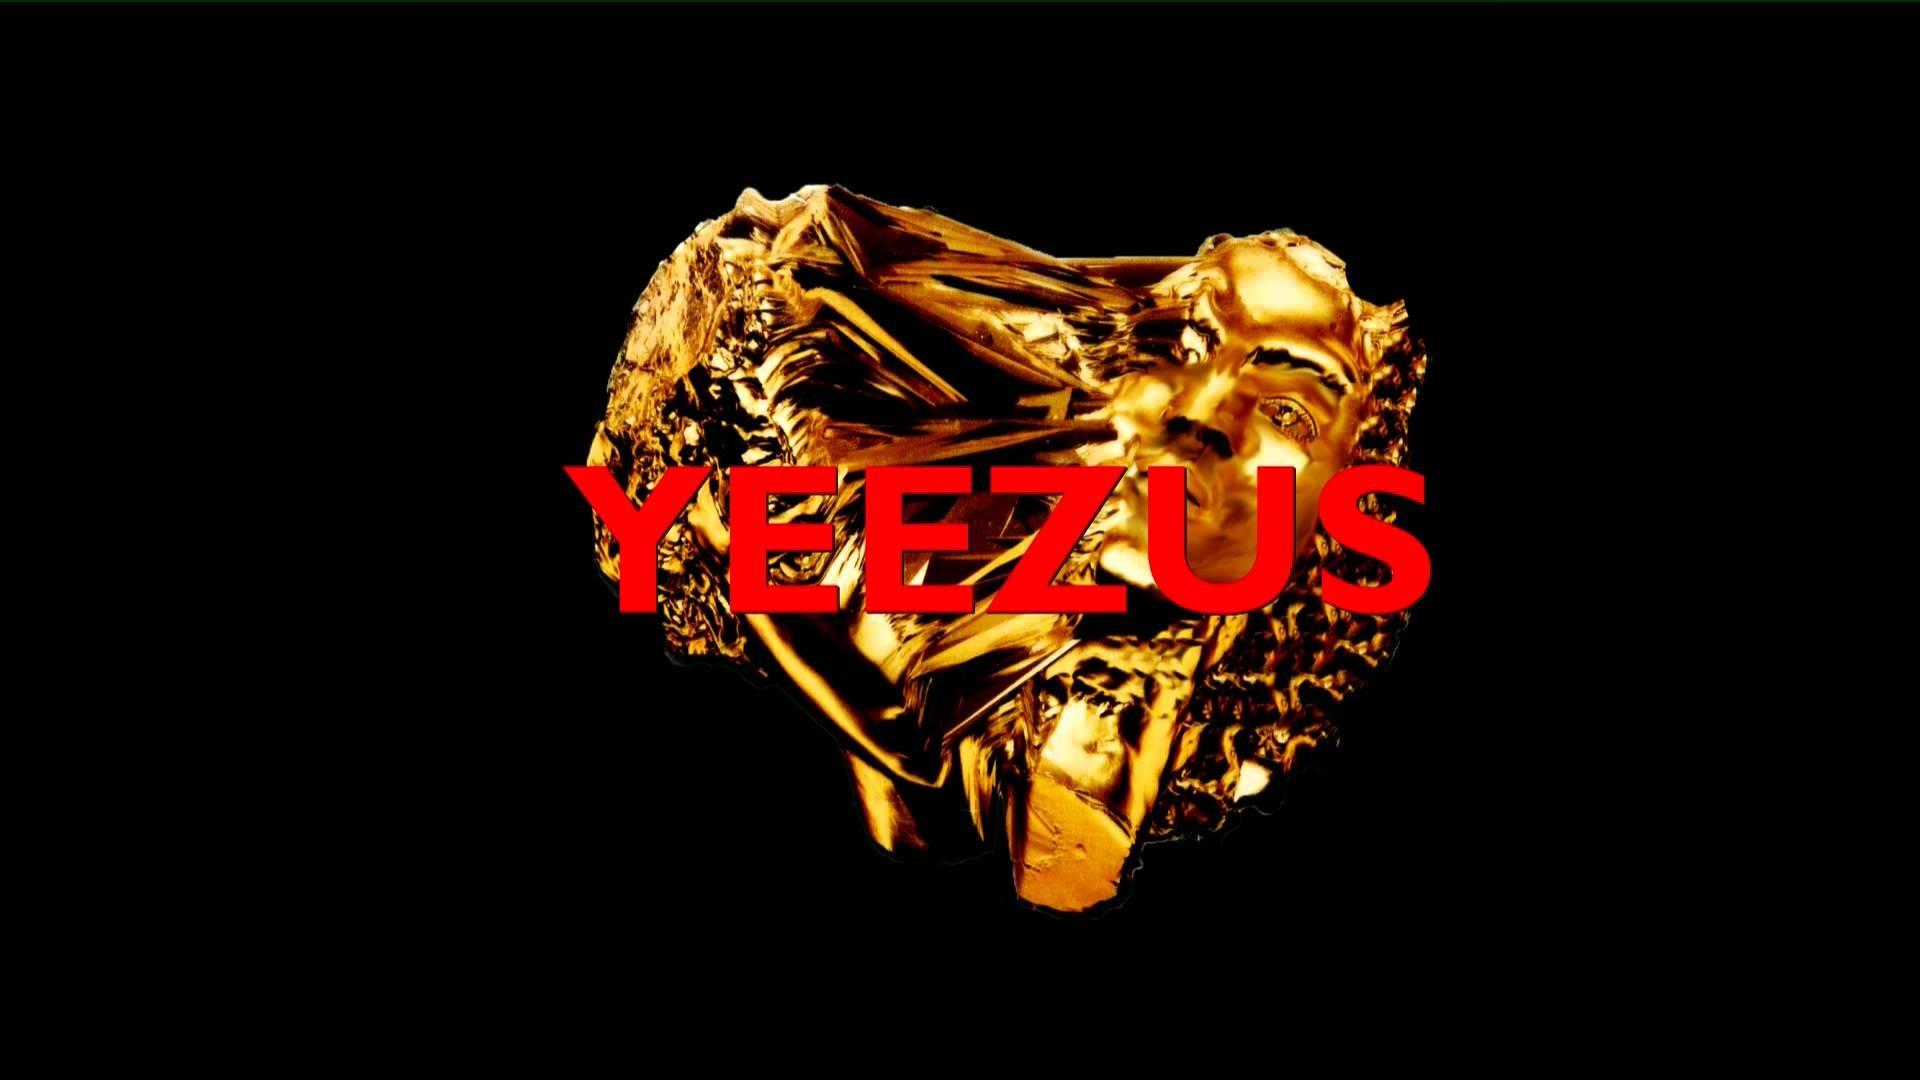 Kanye West *YEEZUS* x Tyler the Creator x Kendrick Lamar .